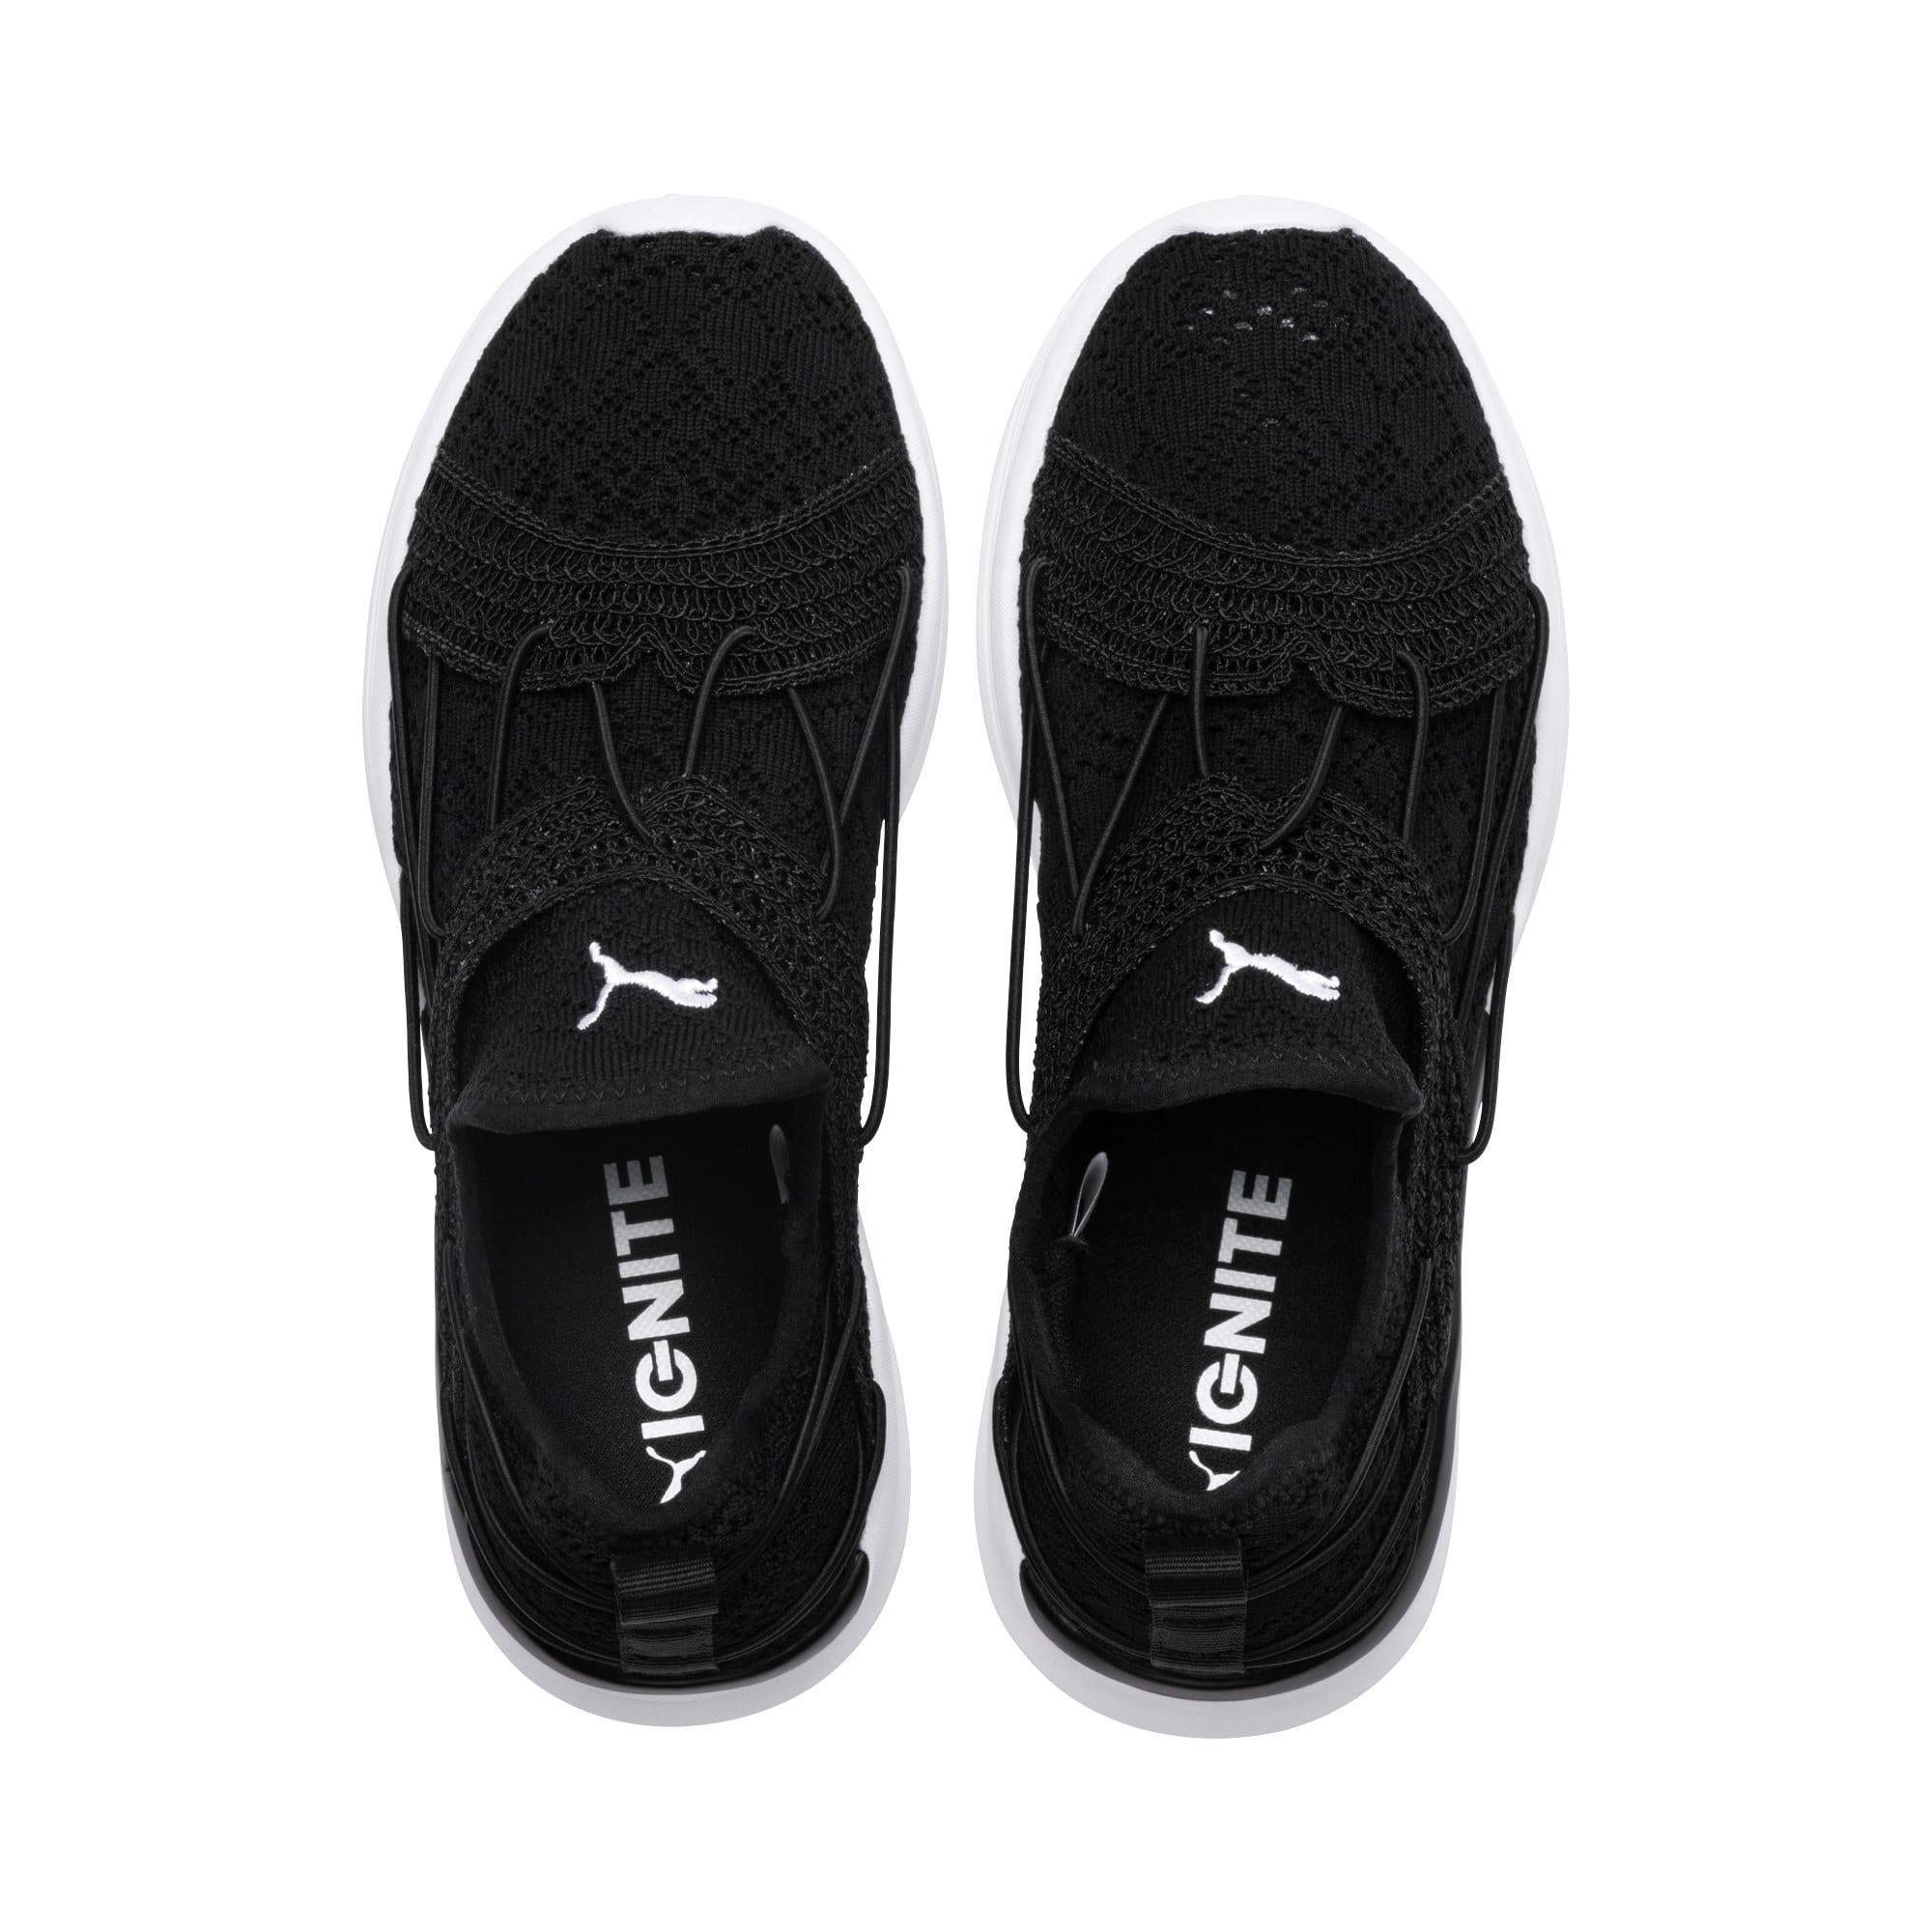 Thumbnail 6 of IGNITE Flash Sensua Women's Running Shoes, Puma Black-Puma White, medium